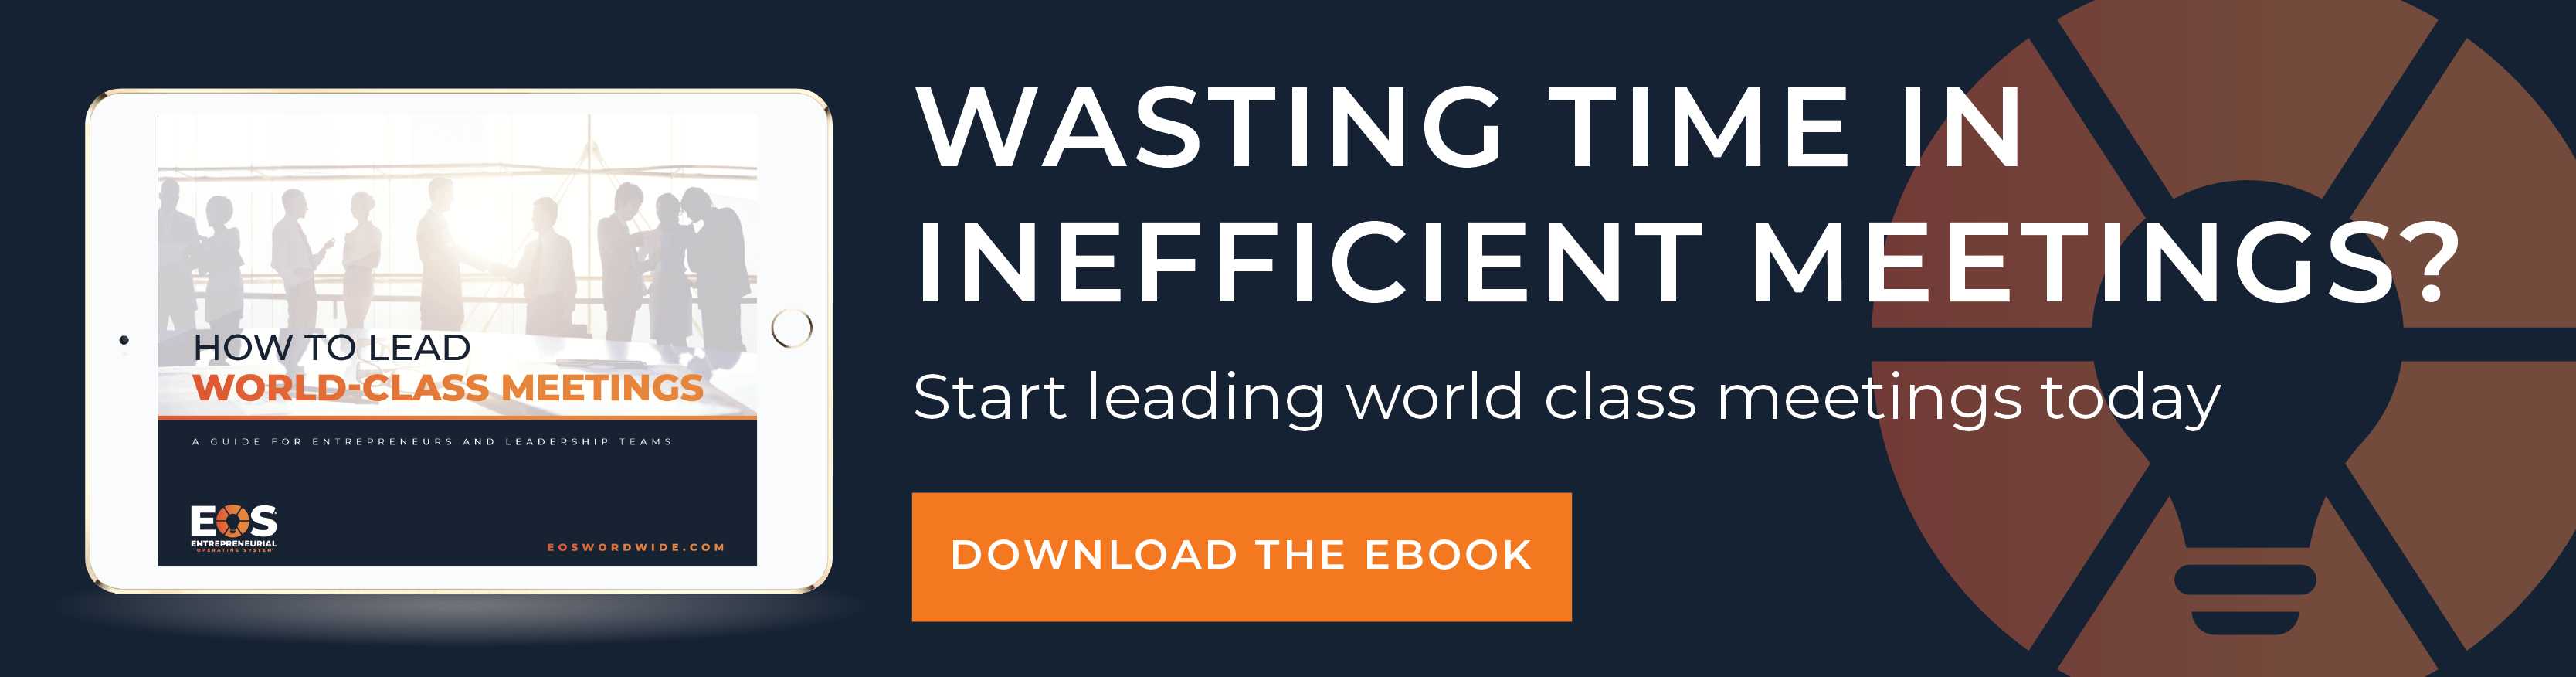 Start leading world-class meetings